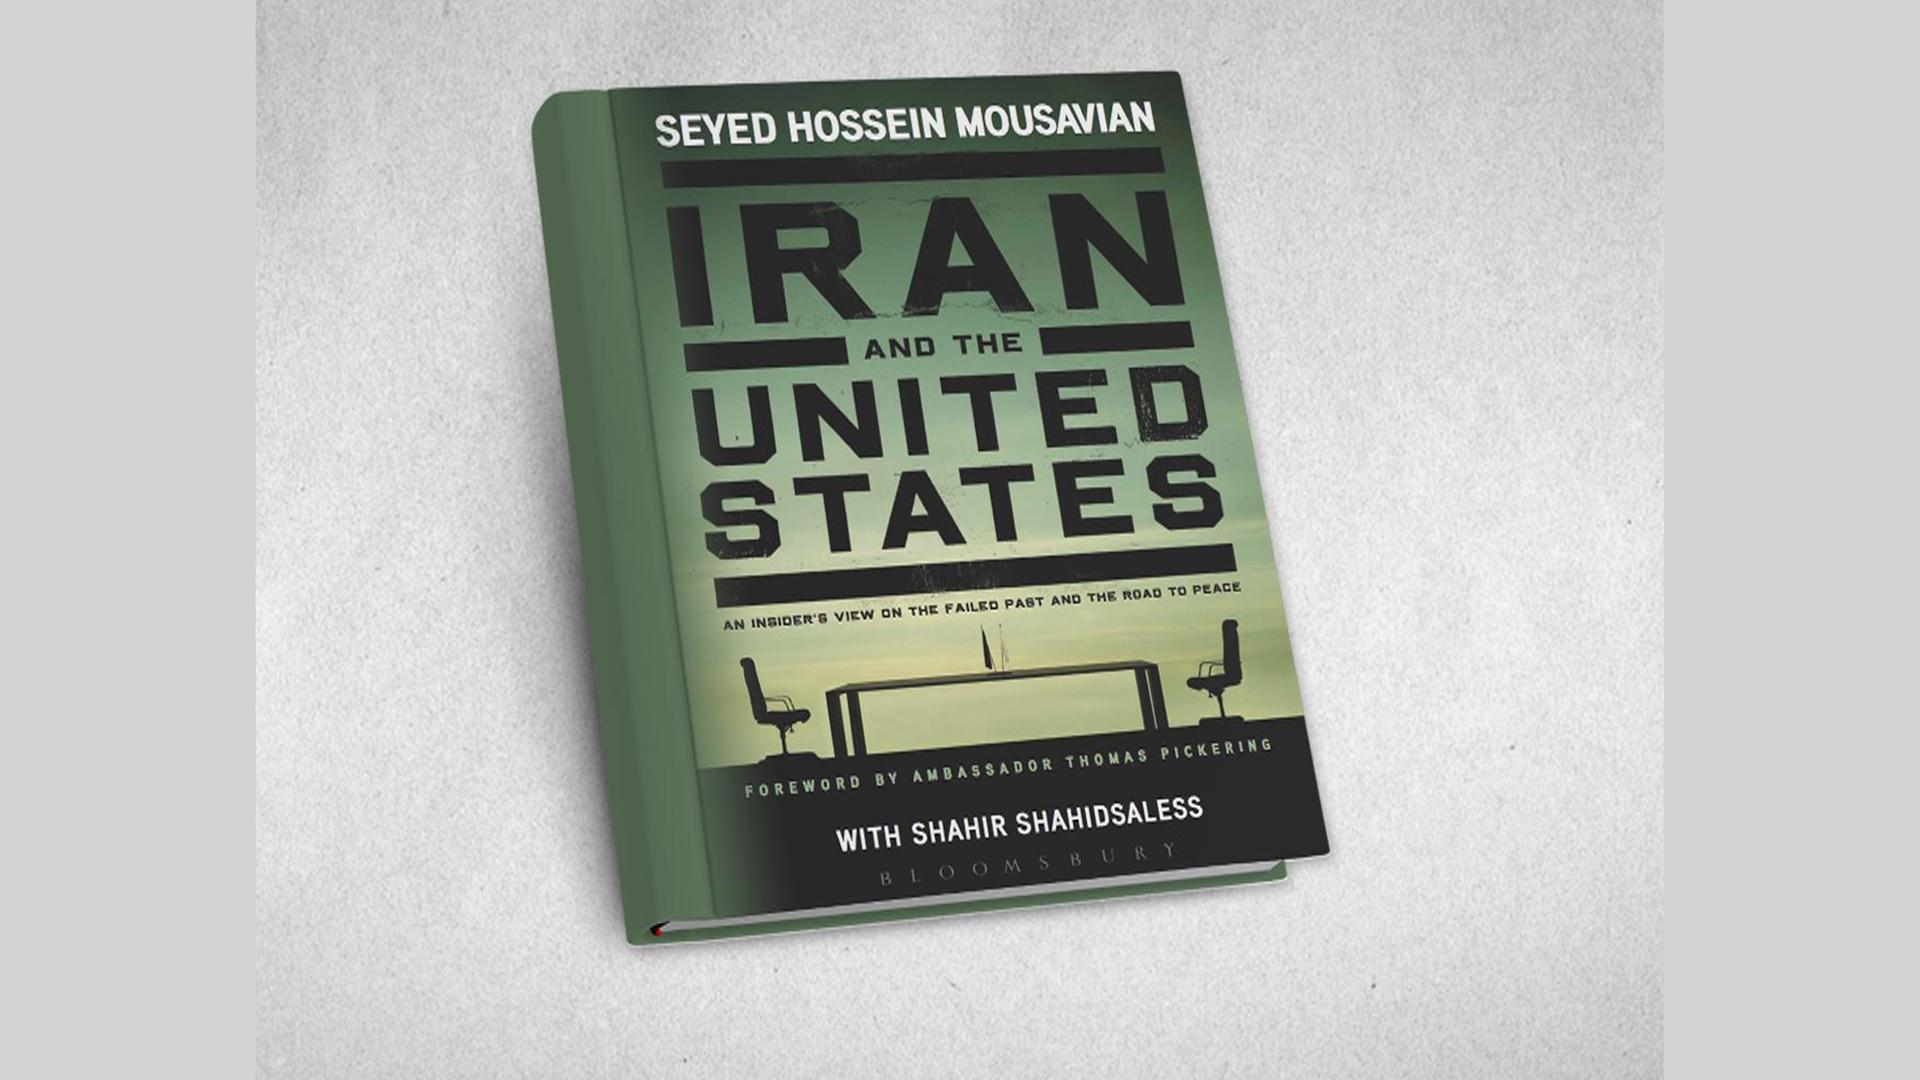 Inside view of Iran, Iraq, & US relationship